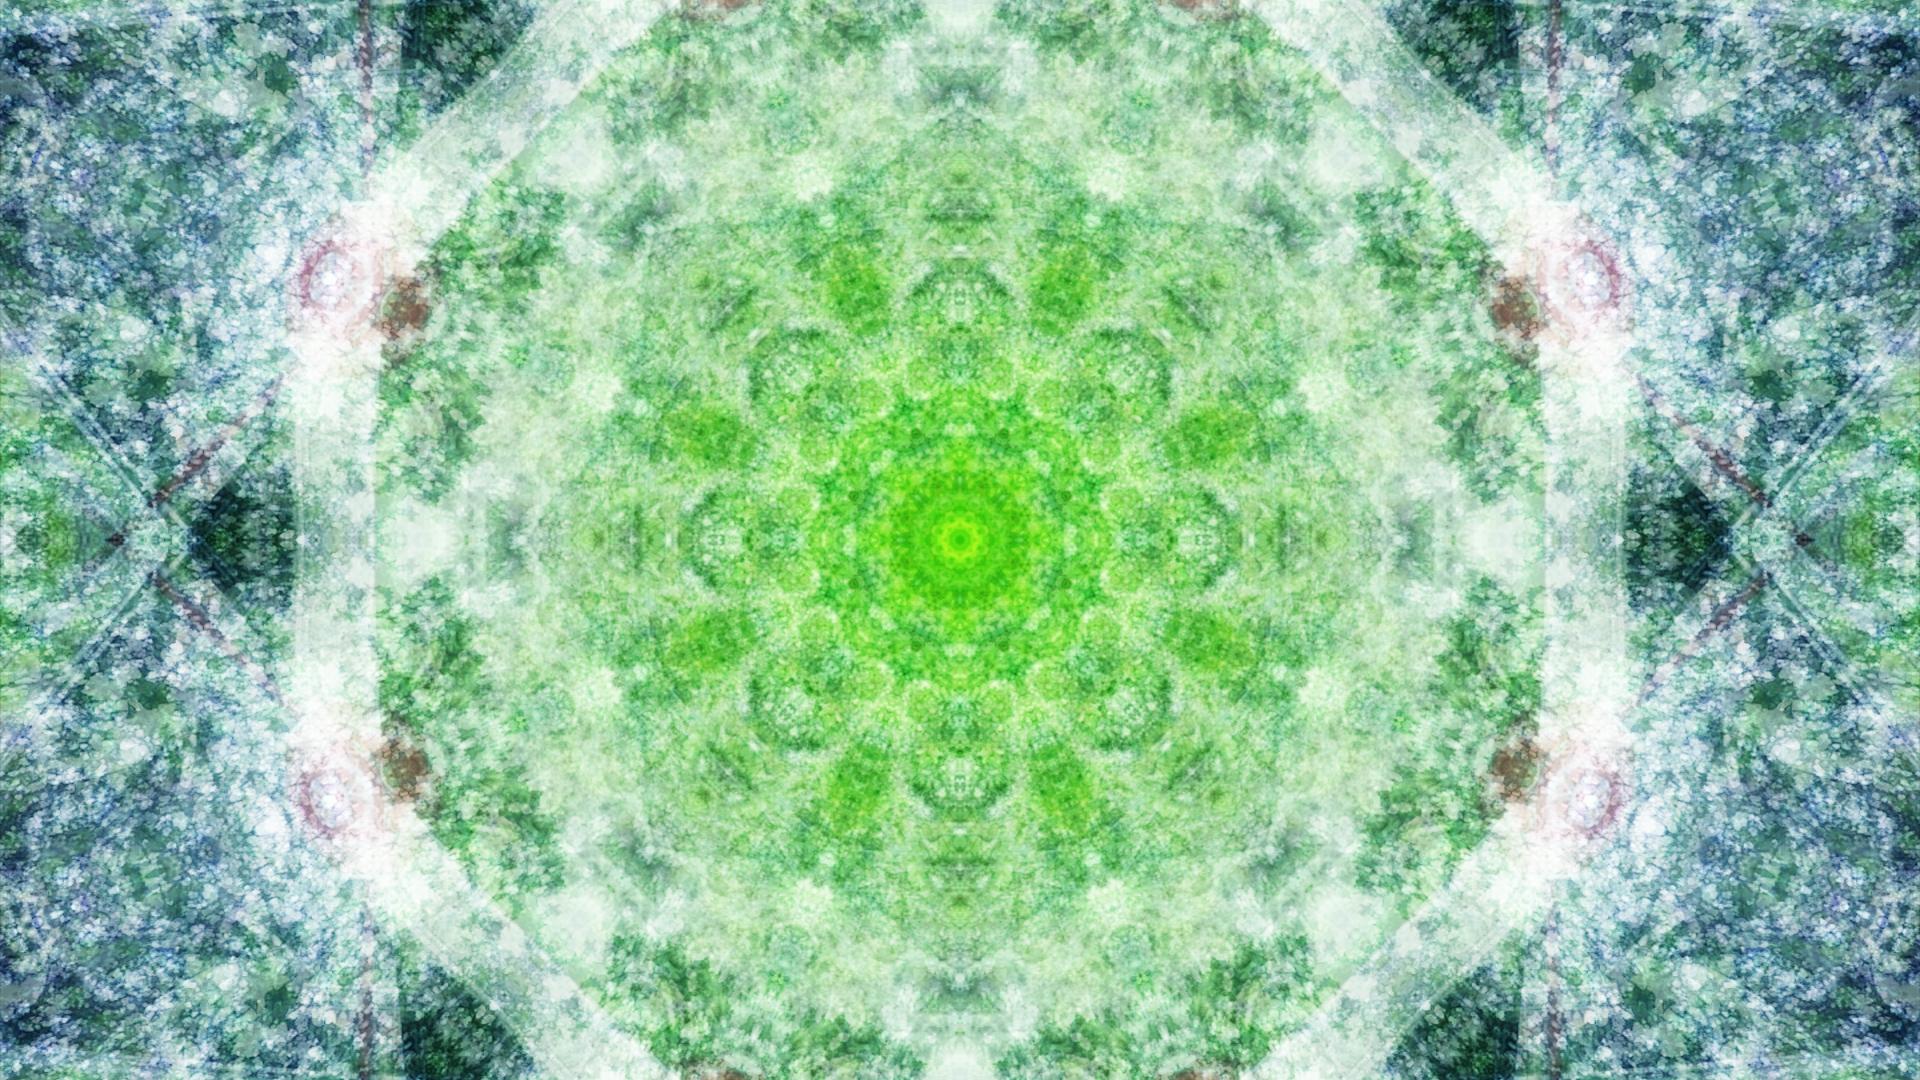 Emitting Velocity - Mohican Forest by Matt Swift Still 19